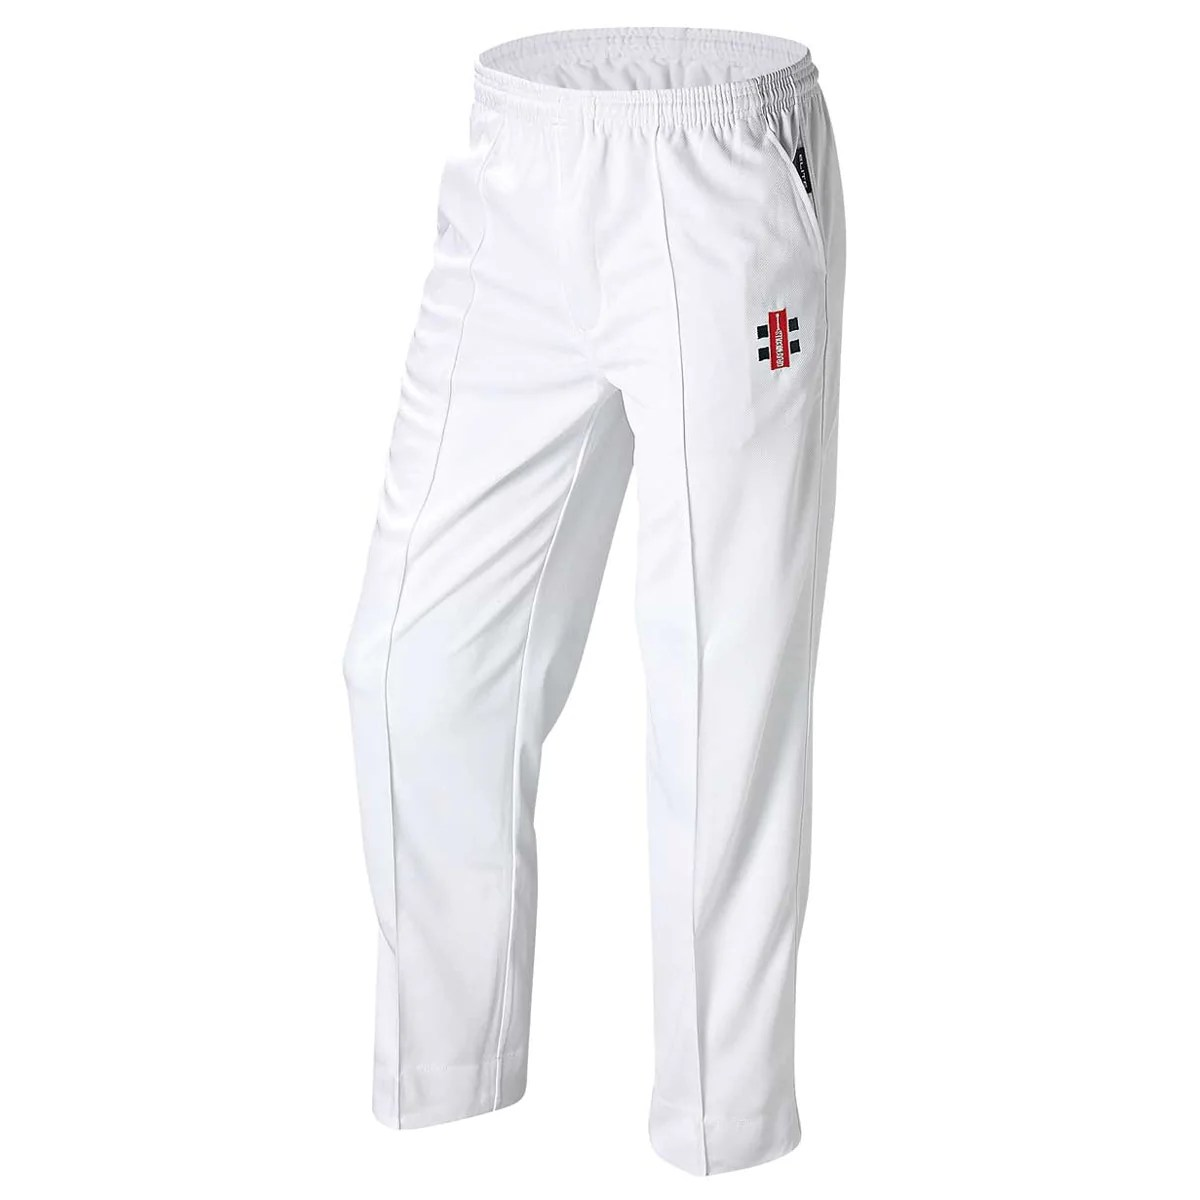 Gray Nicolls Senior Elite Cricket Pants - White